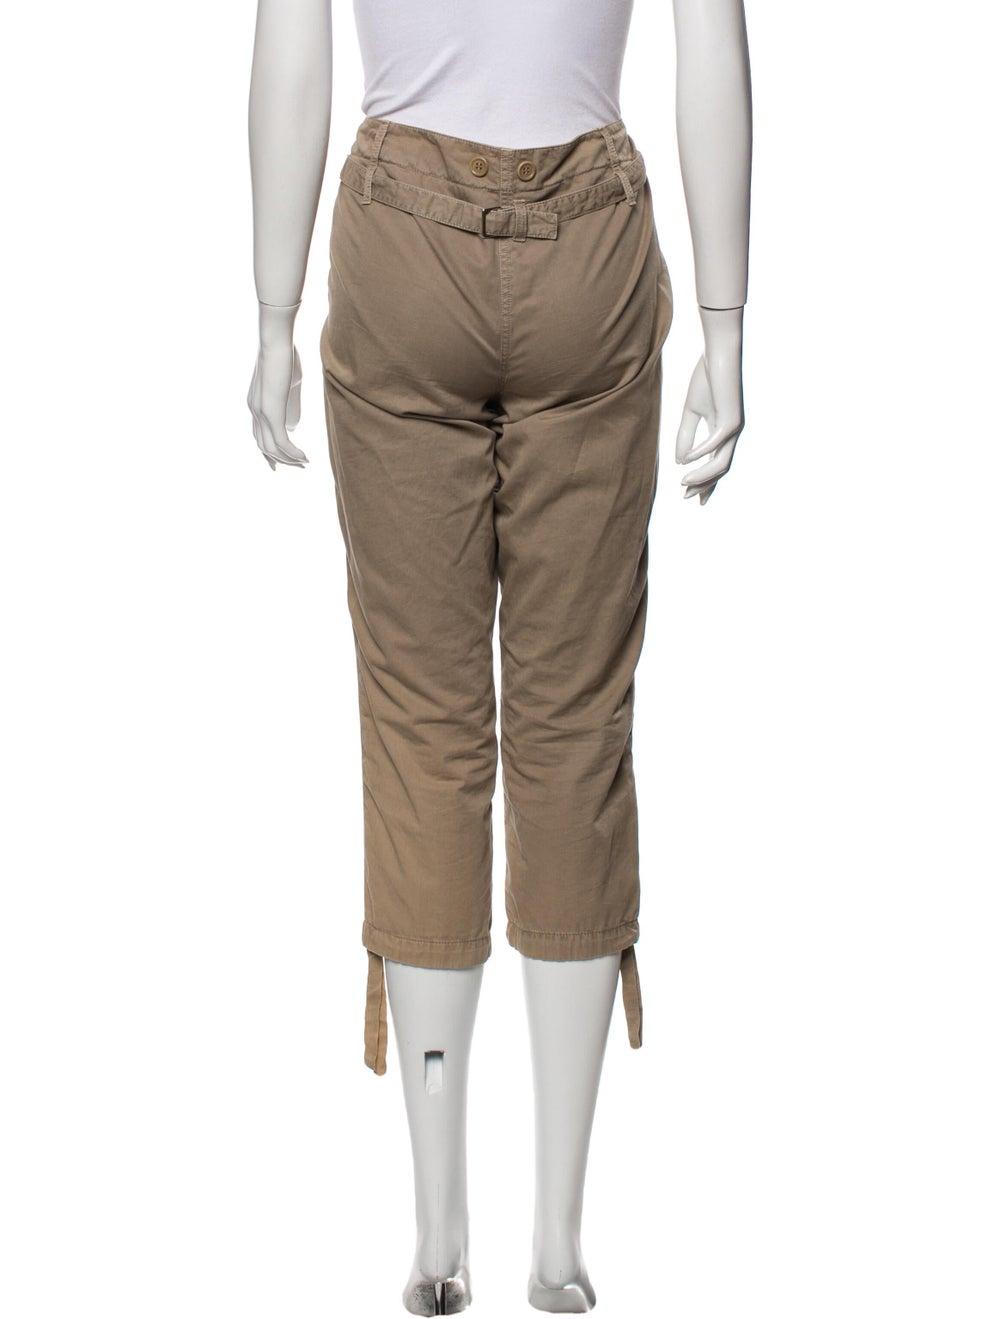 Prada Sport Straight Leg Pants - image 3